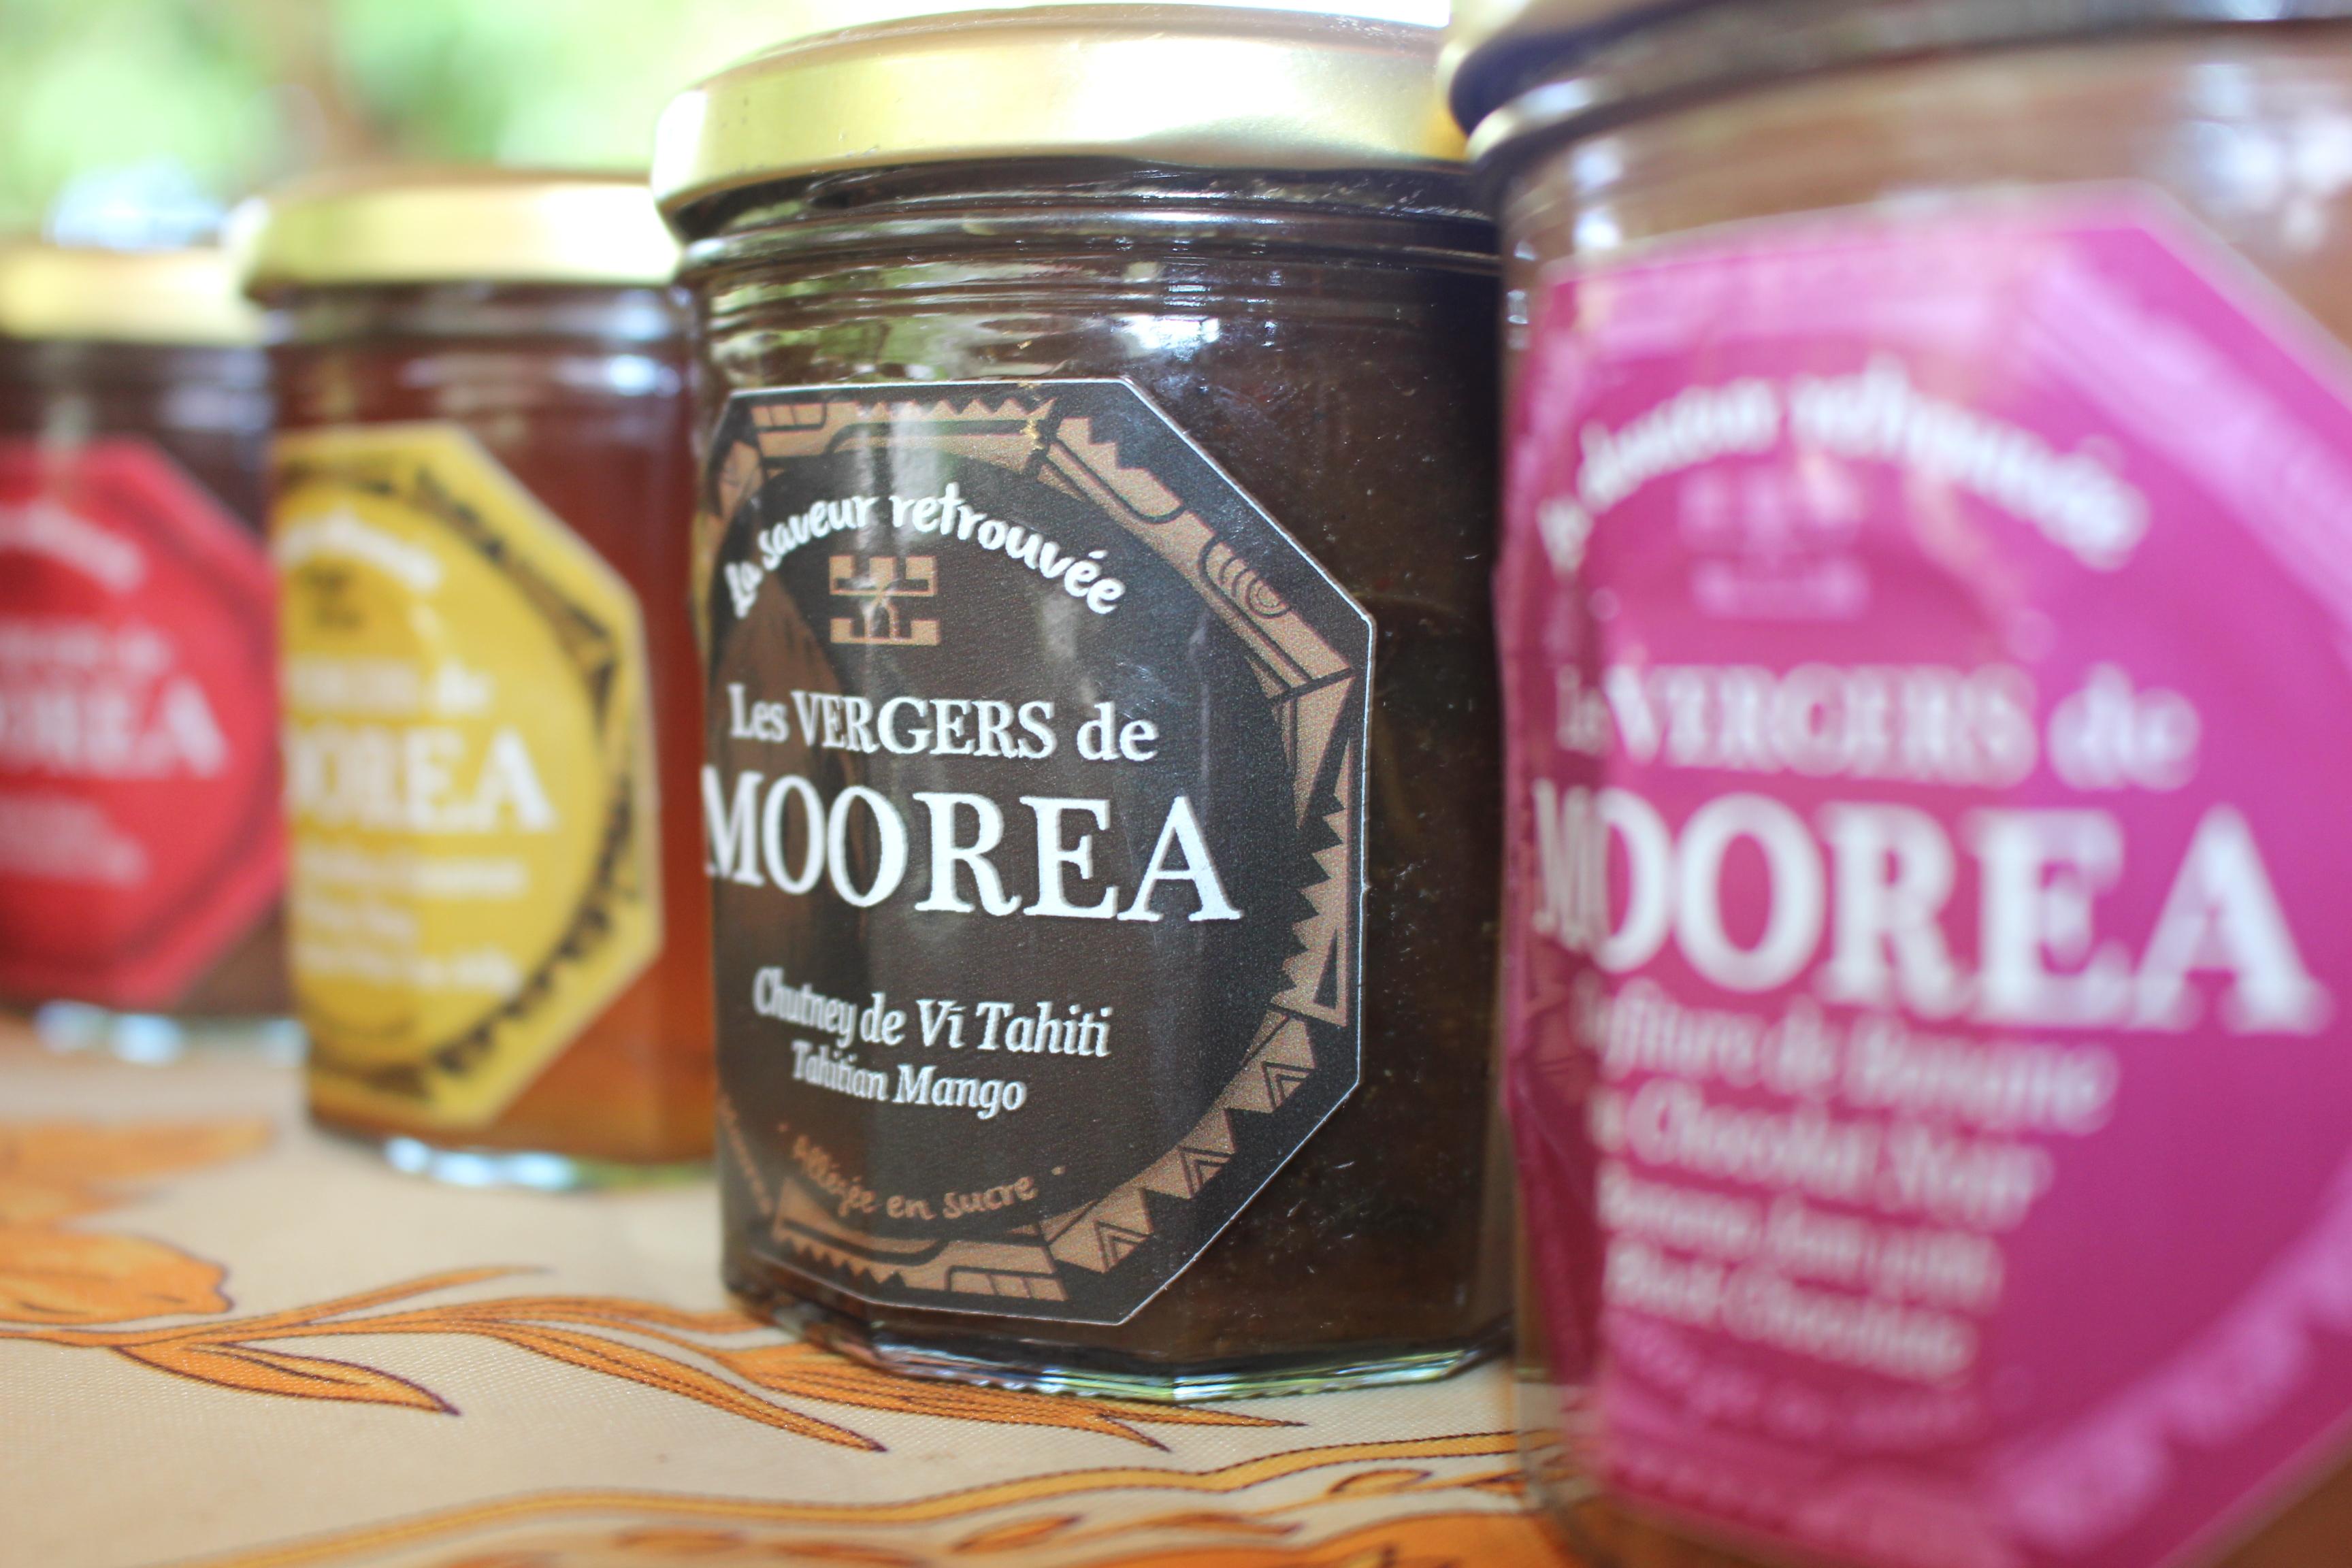 Les Vergers de Moorea où les goûts retrouvés